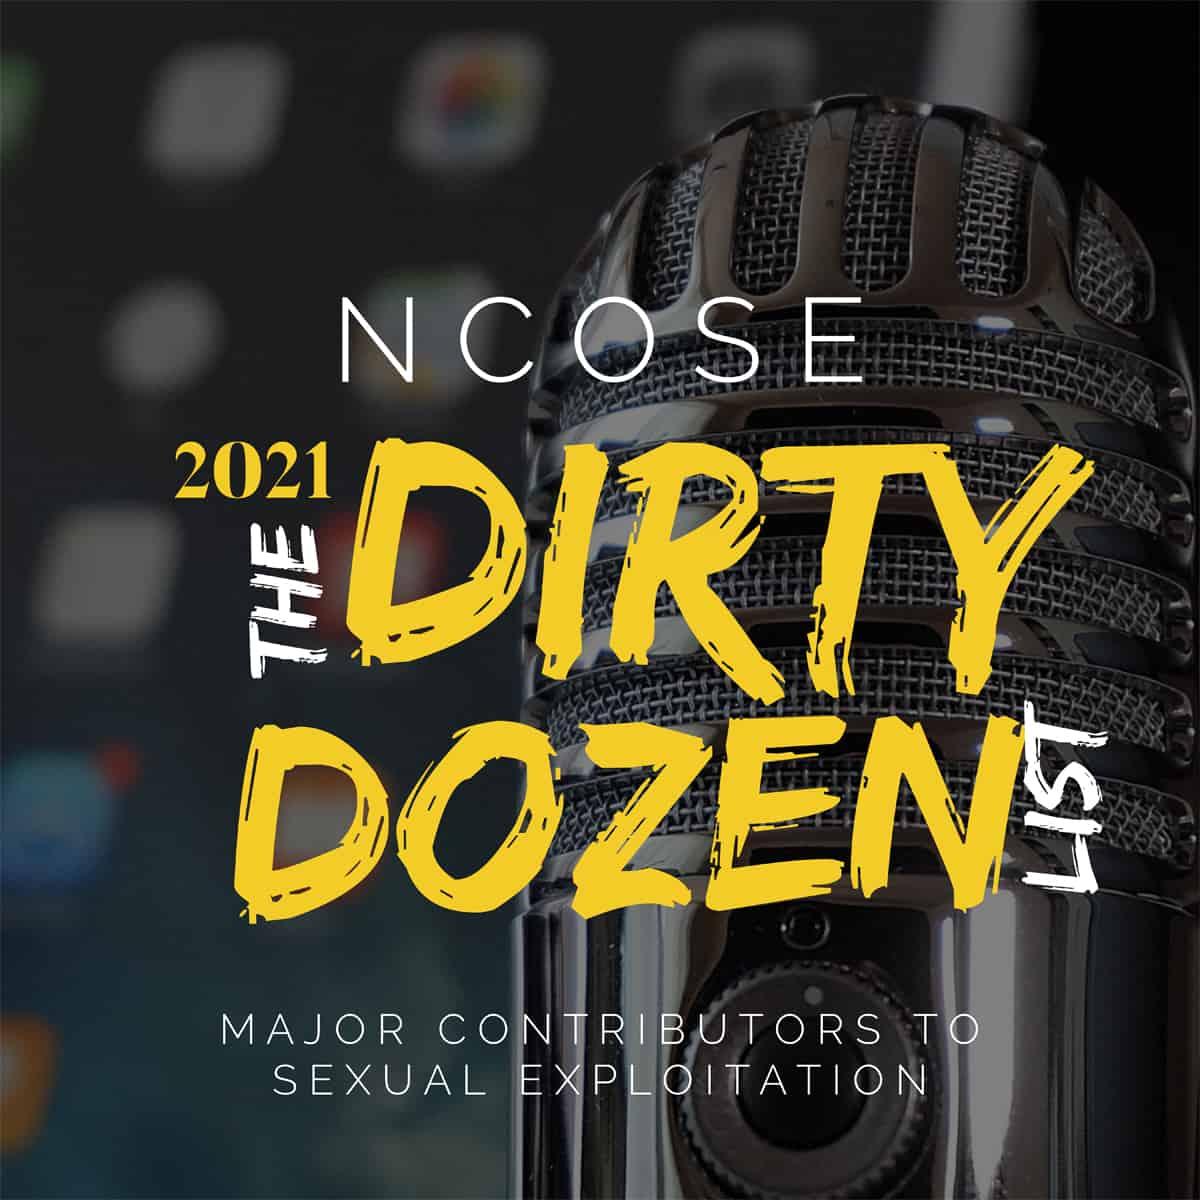 Ep. 62: NCOSE 2021 Dirty Dozen List